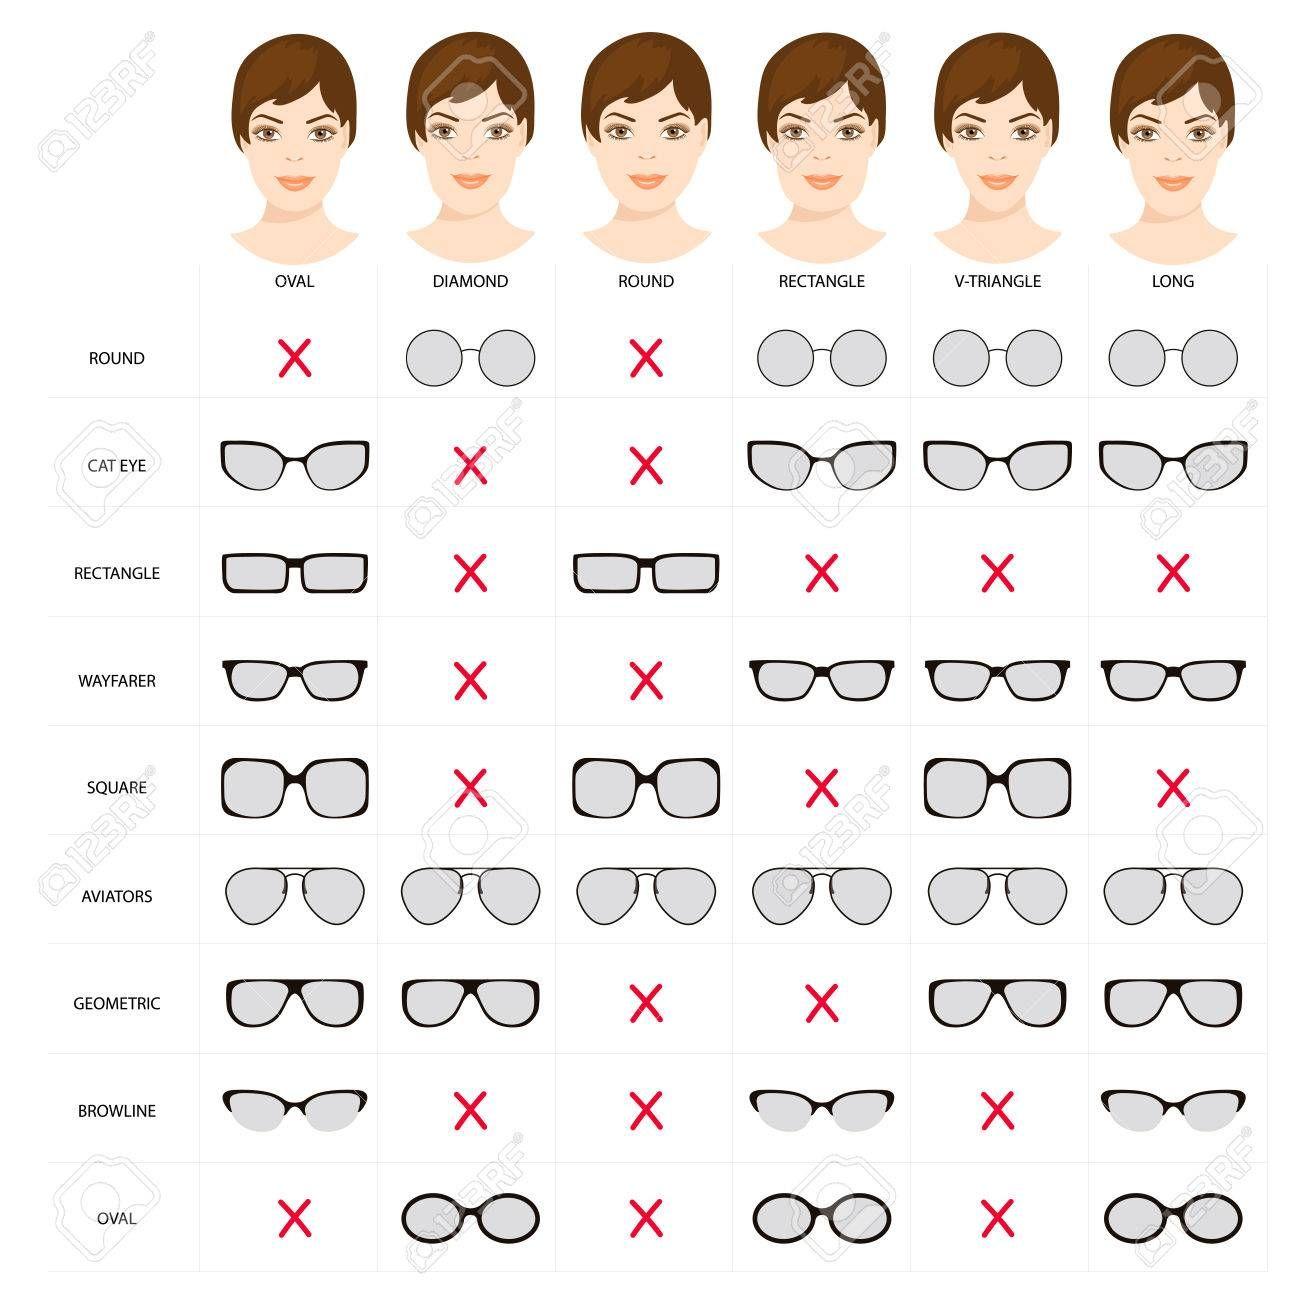 Photo of Right glasses for women s face shape. Stock vector illustration